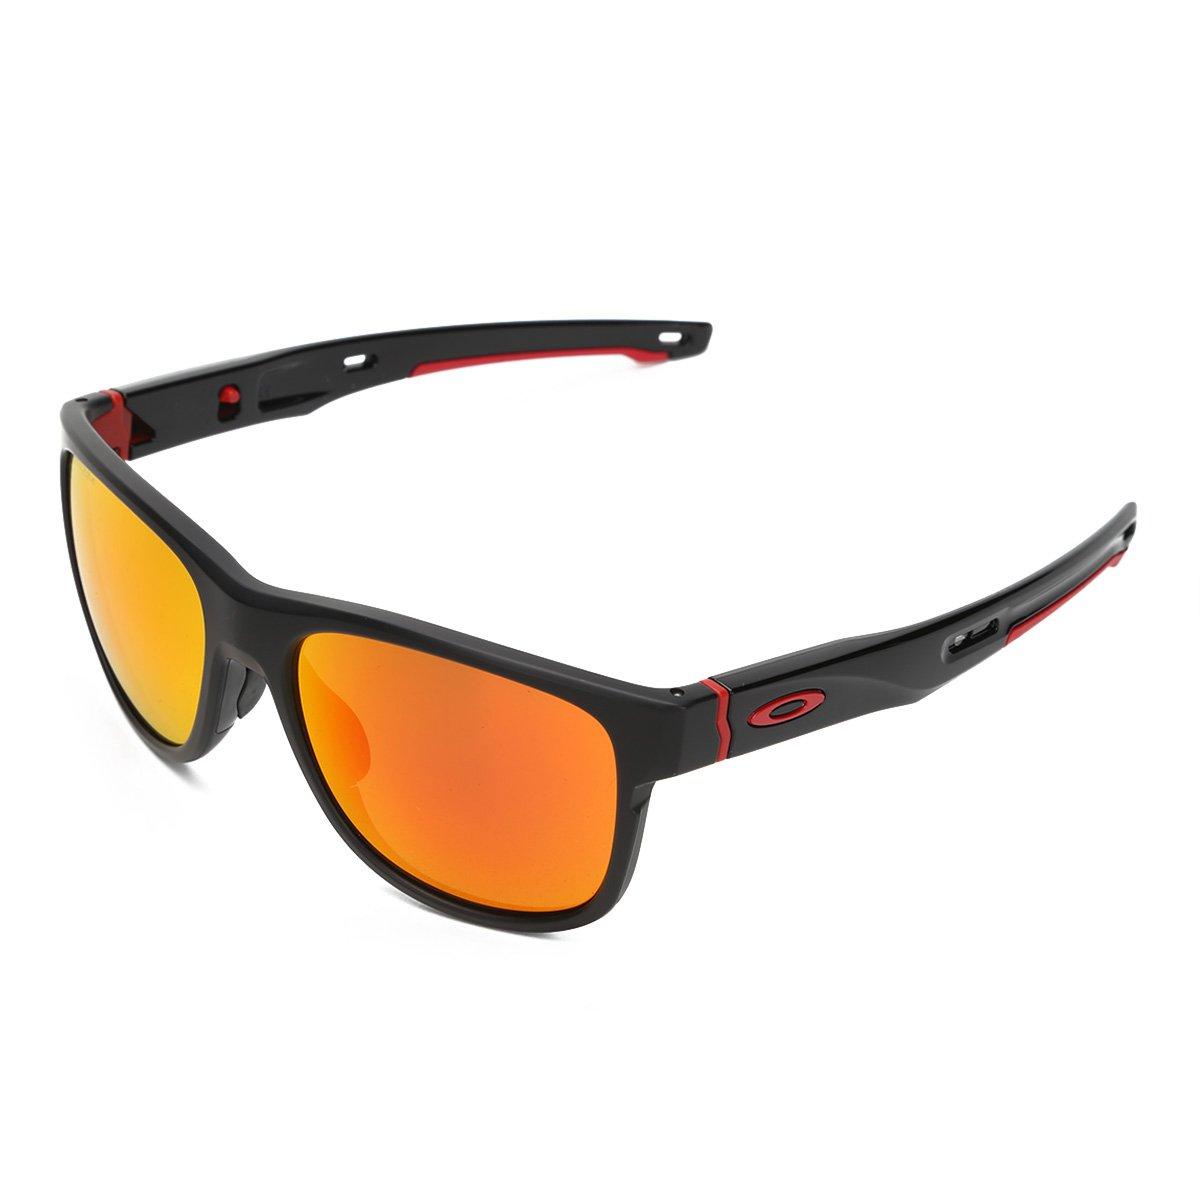 d8b1f21349a20 Óculos de Sol Oakley Crossrange R Masculino - Preto e Vermelho ...